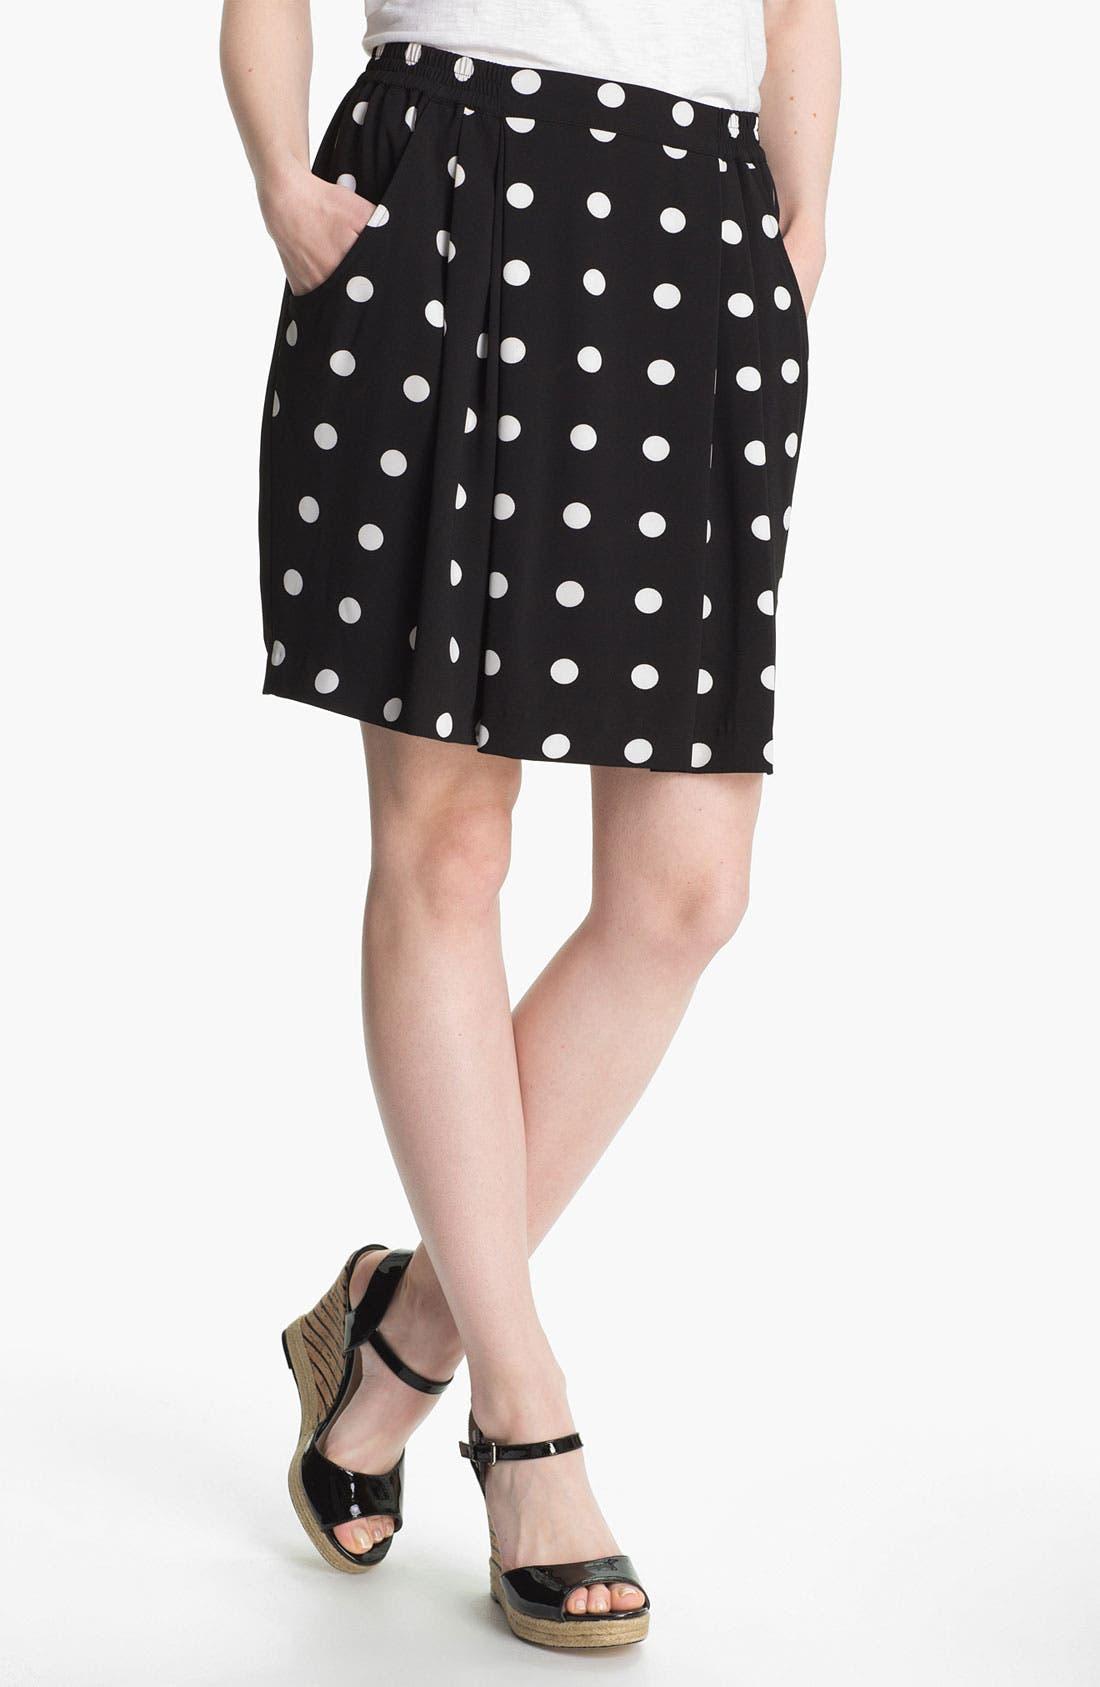 Alternate Image 1 Selected - Halogen®  Blazer & Skirt, Caslon® Tee